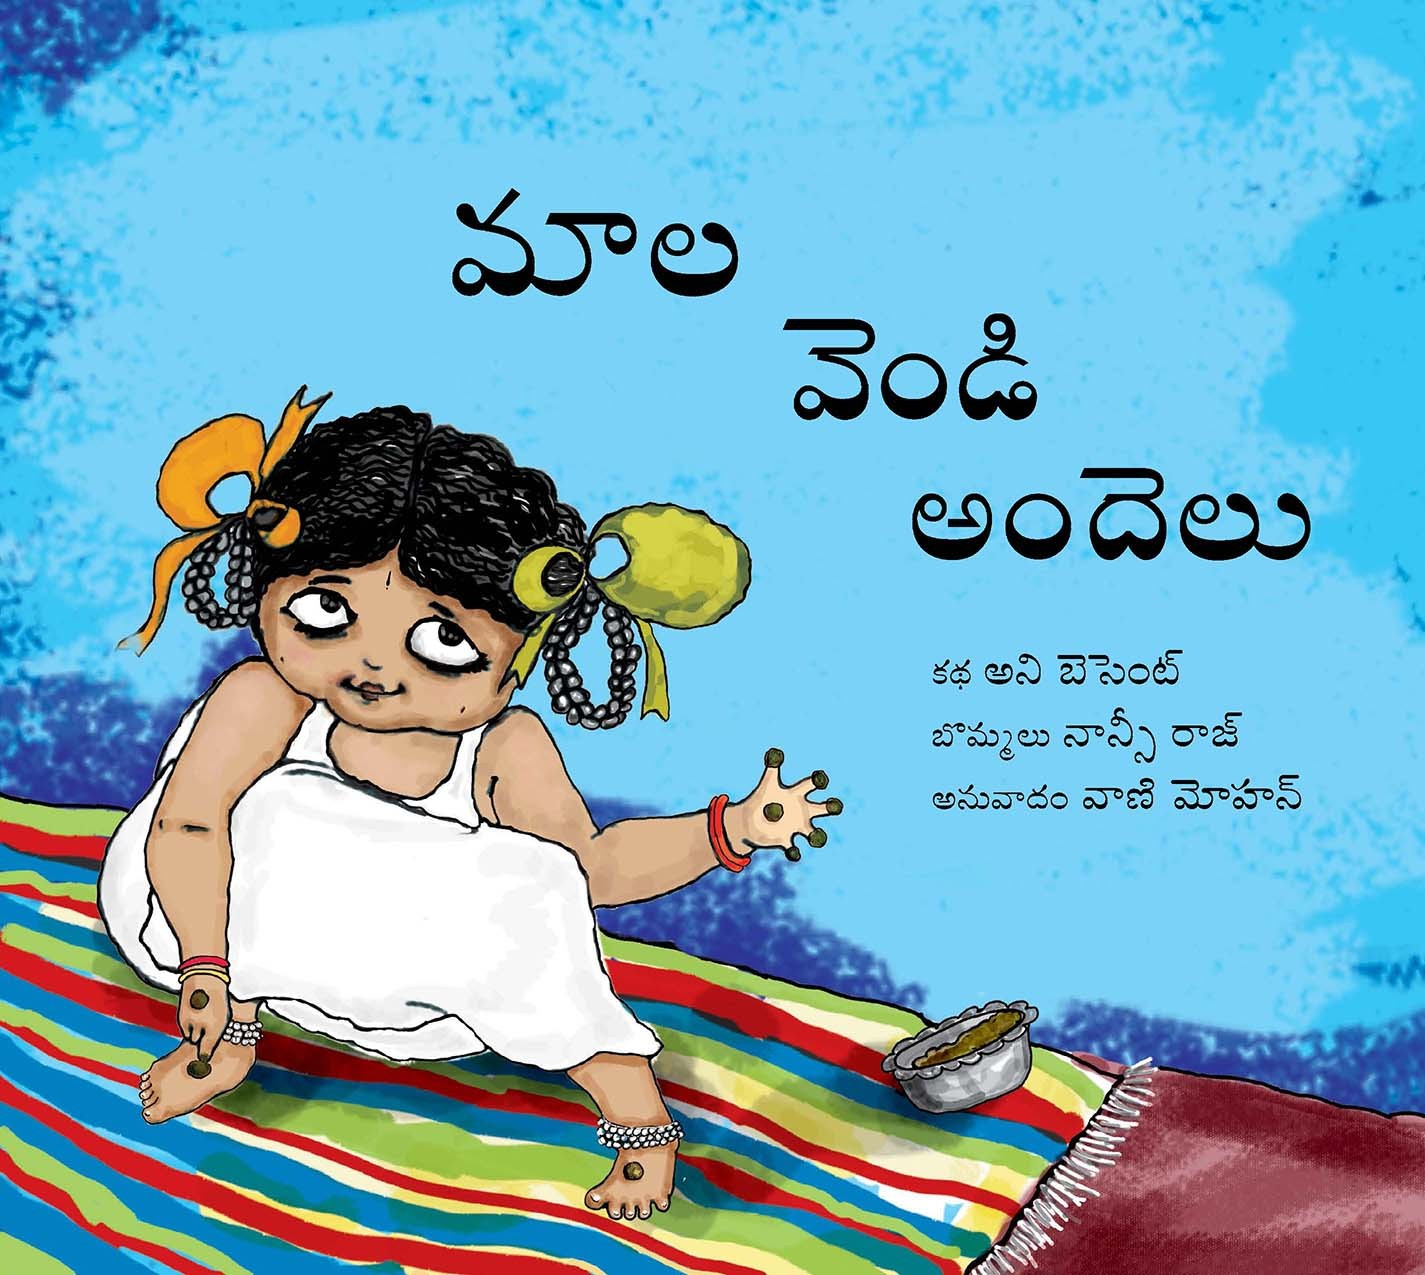 Mala's Silver Anklets/Mala Vendi Andelu (Telugu)